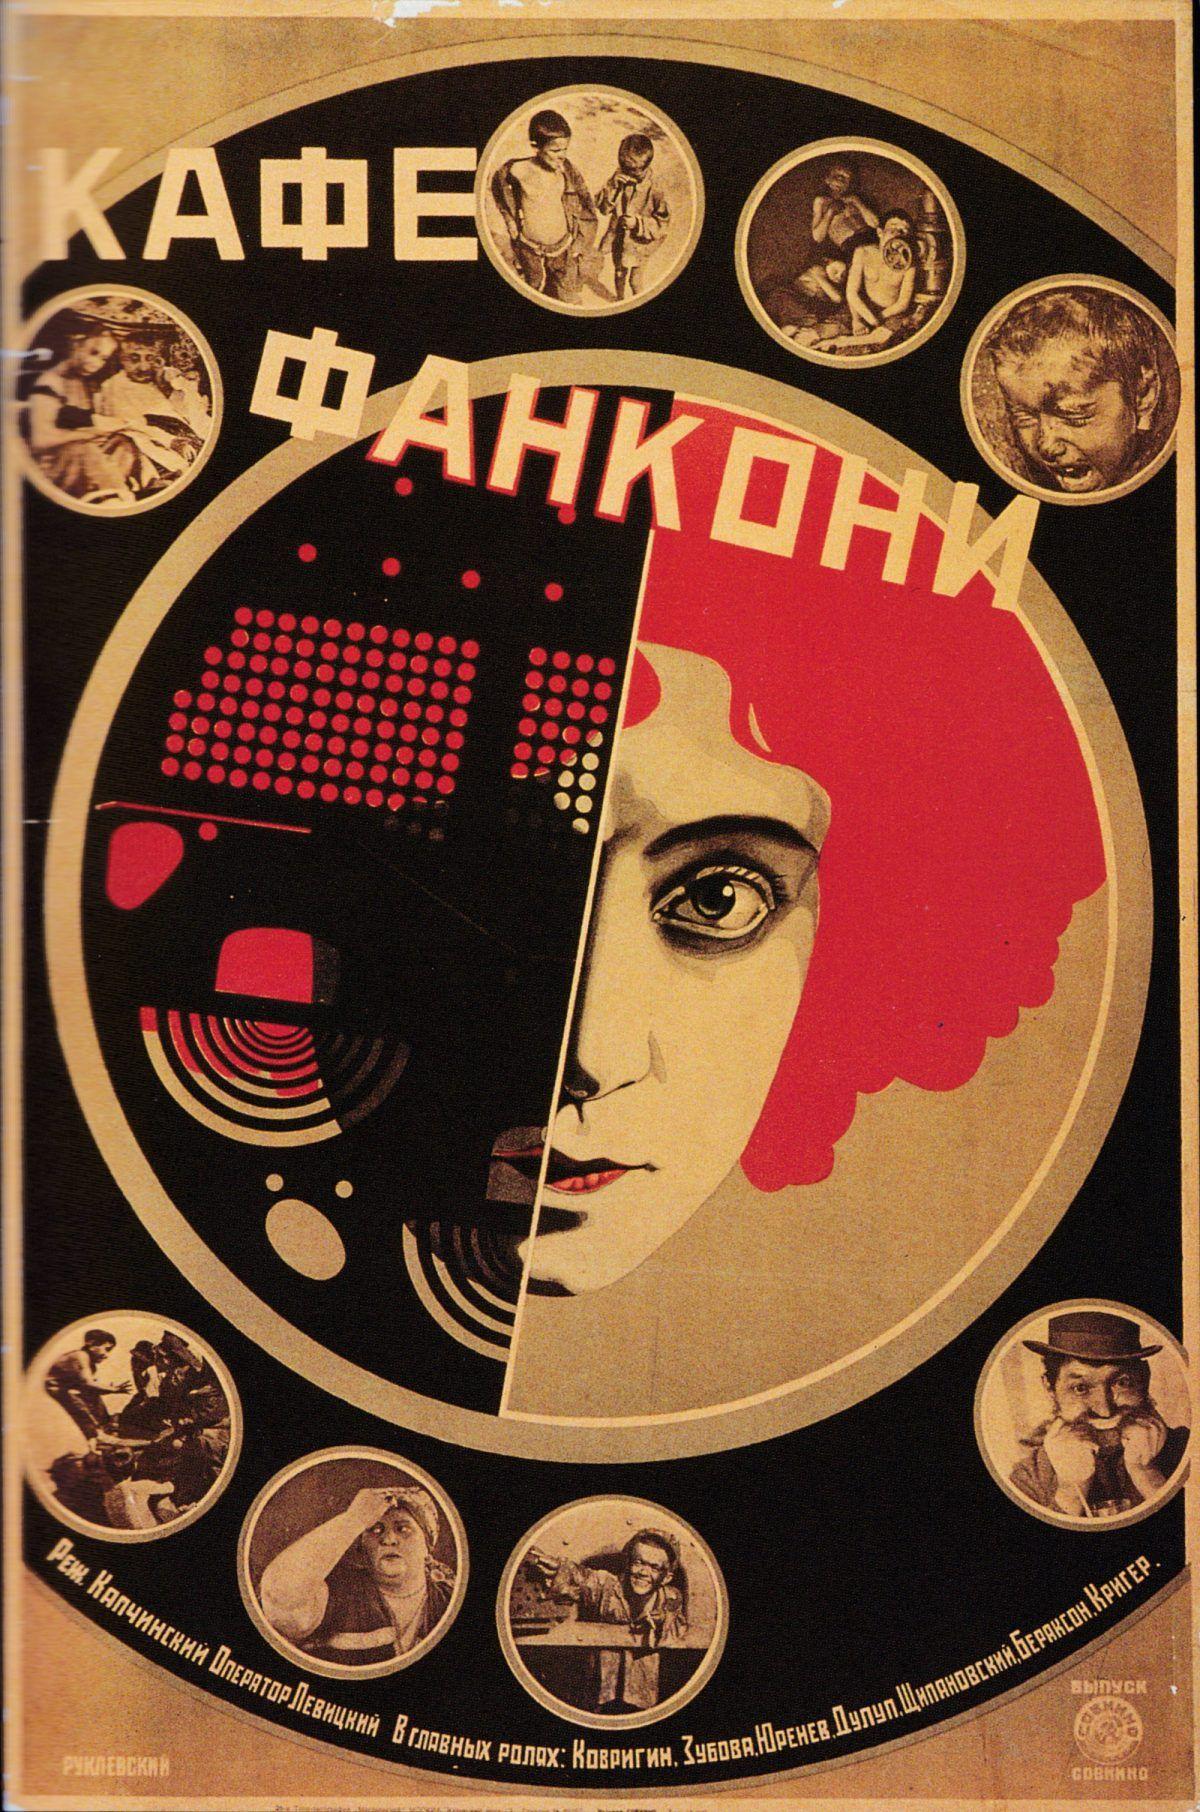 Reproduction Avant-Garde Dada Poster 1923 6 Lithos Kurt Schwitters